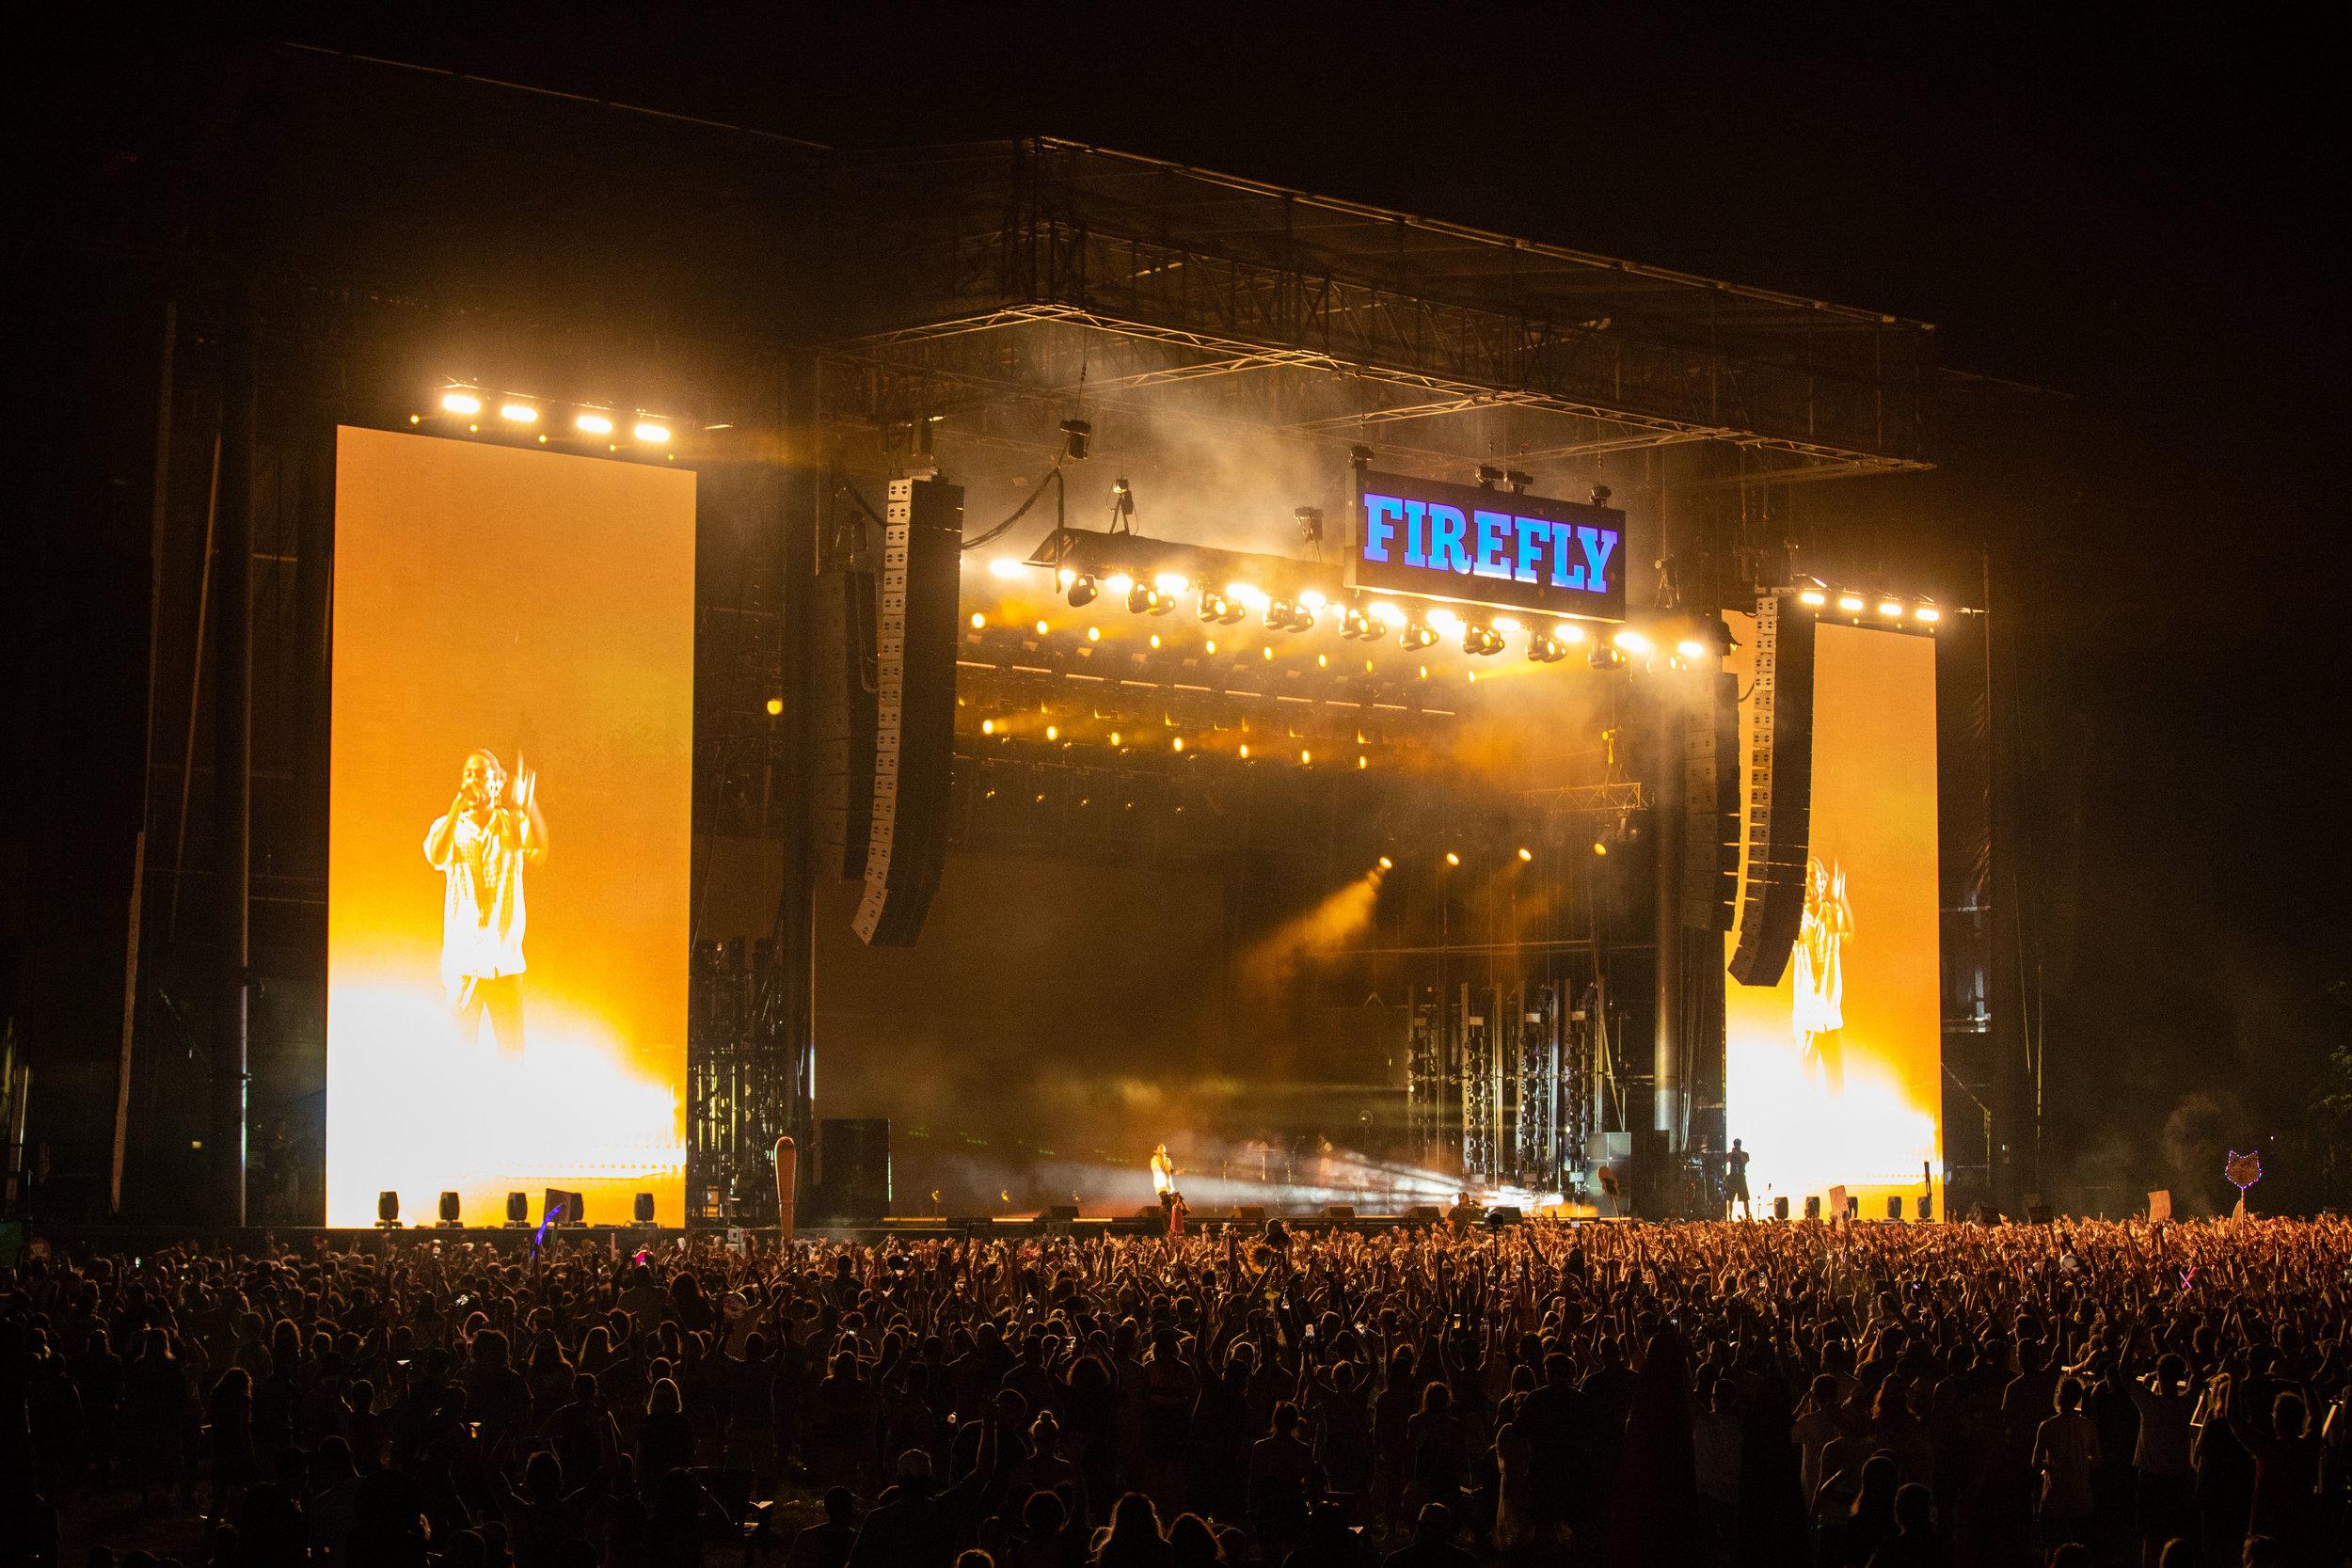 Poulos-Firefly2018-KendrickLamar-12.jpg